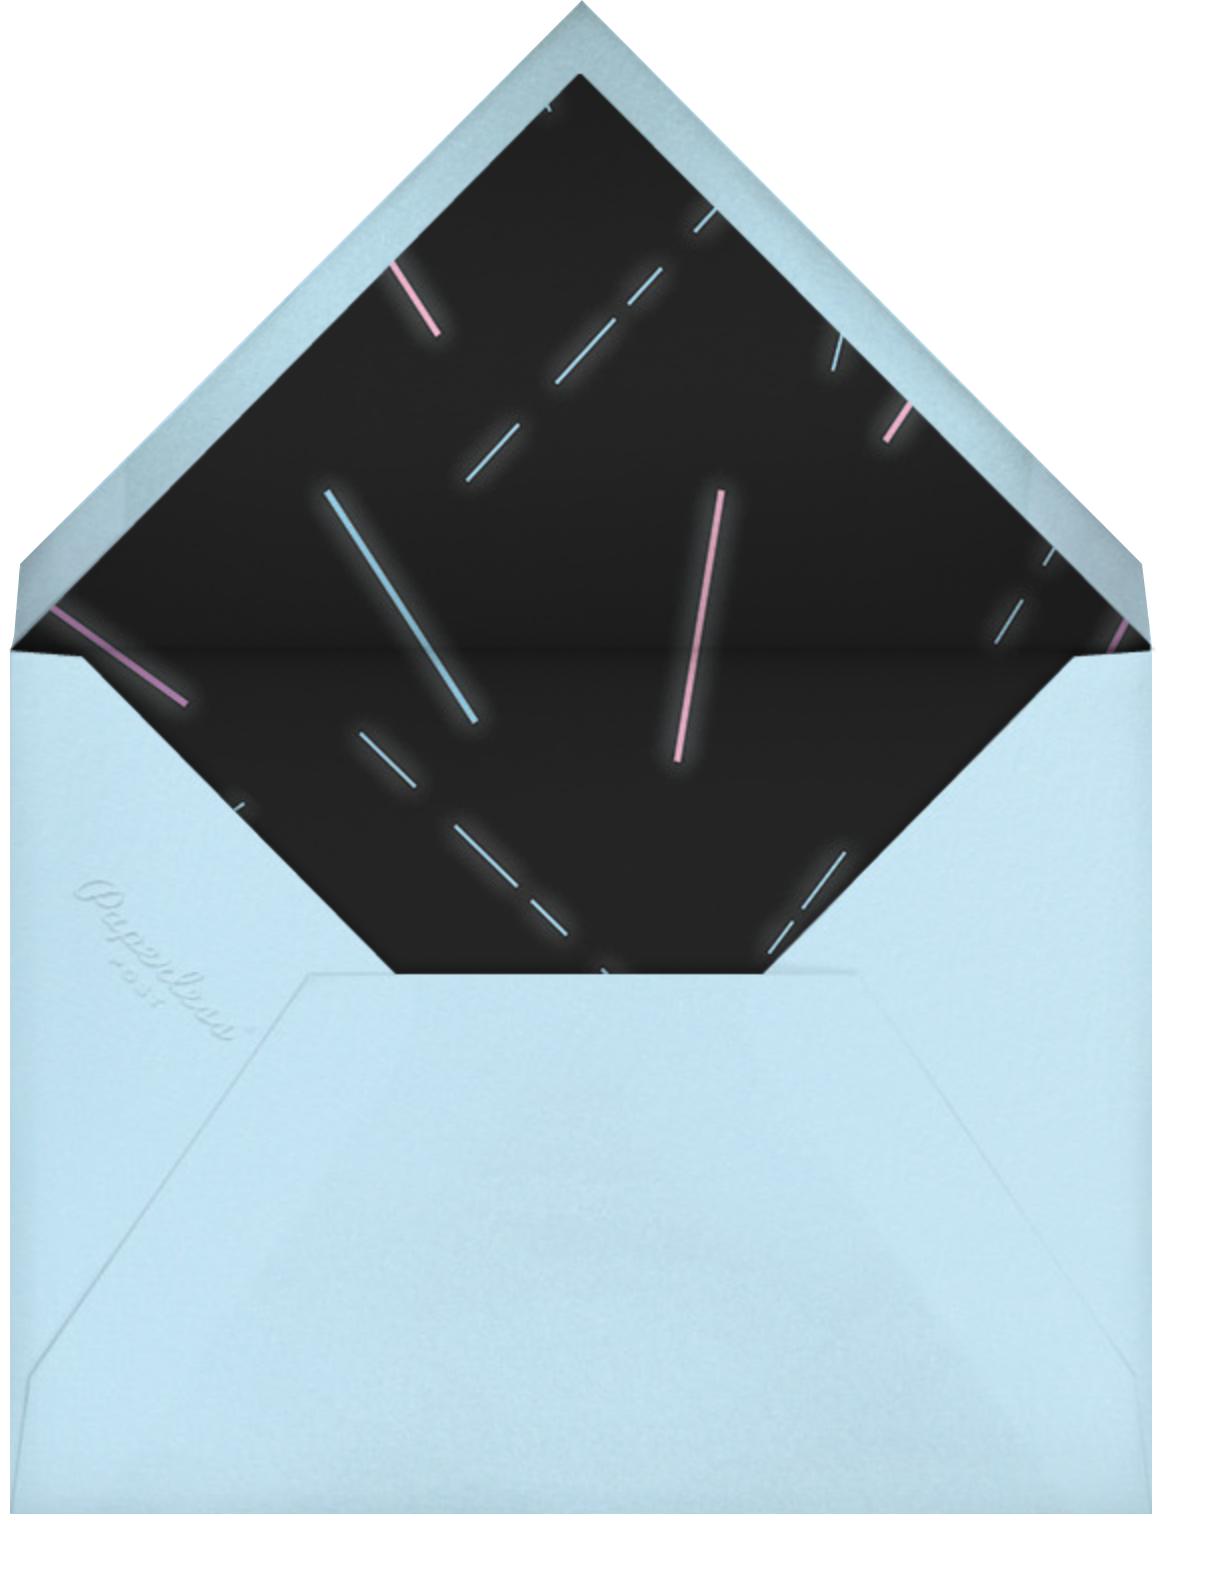 Ultra Light Beams (Horizontal) - Paperless Post - Envelope